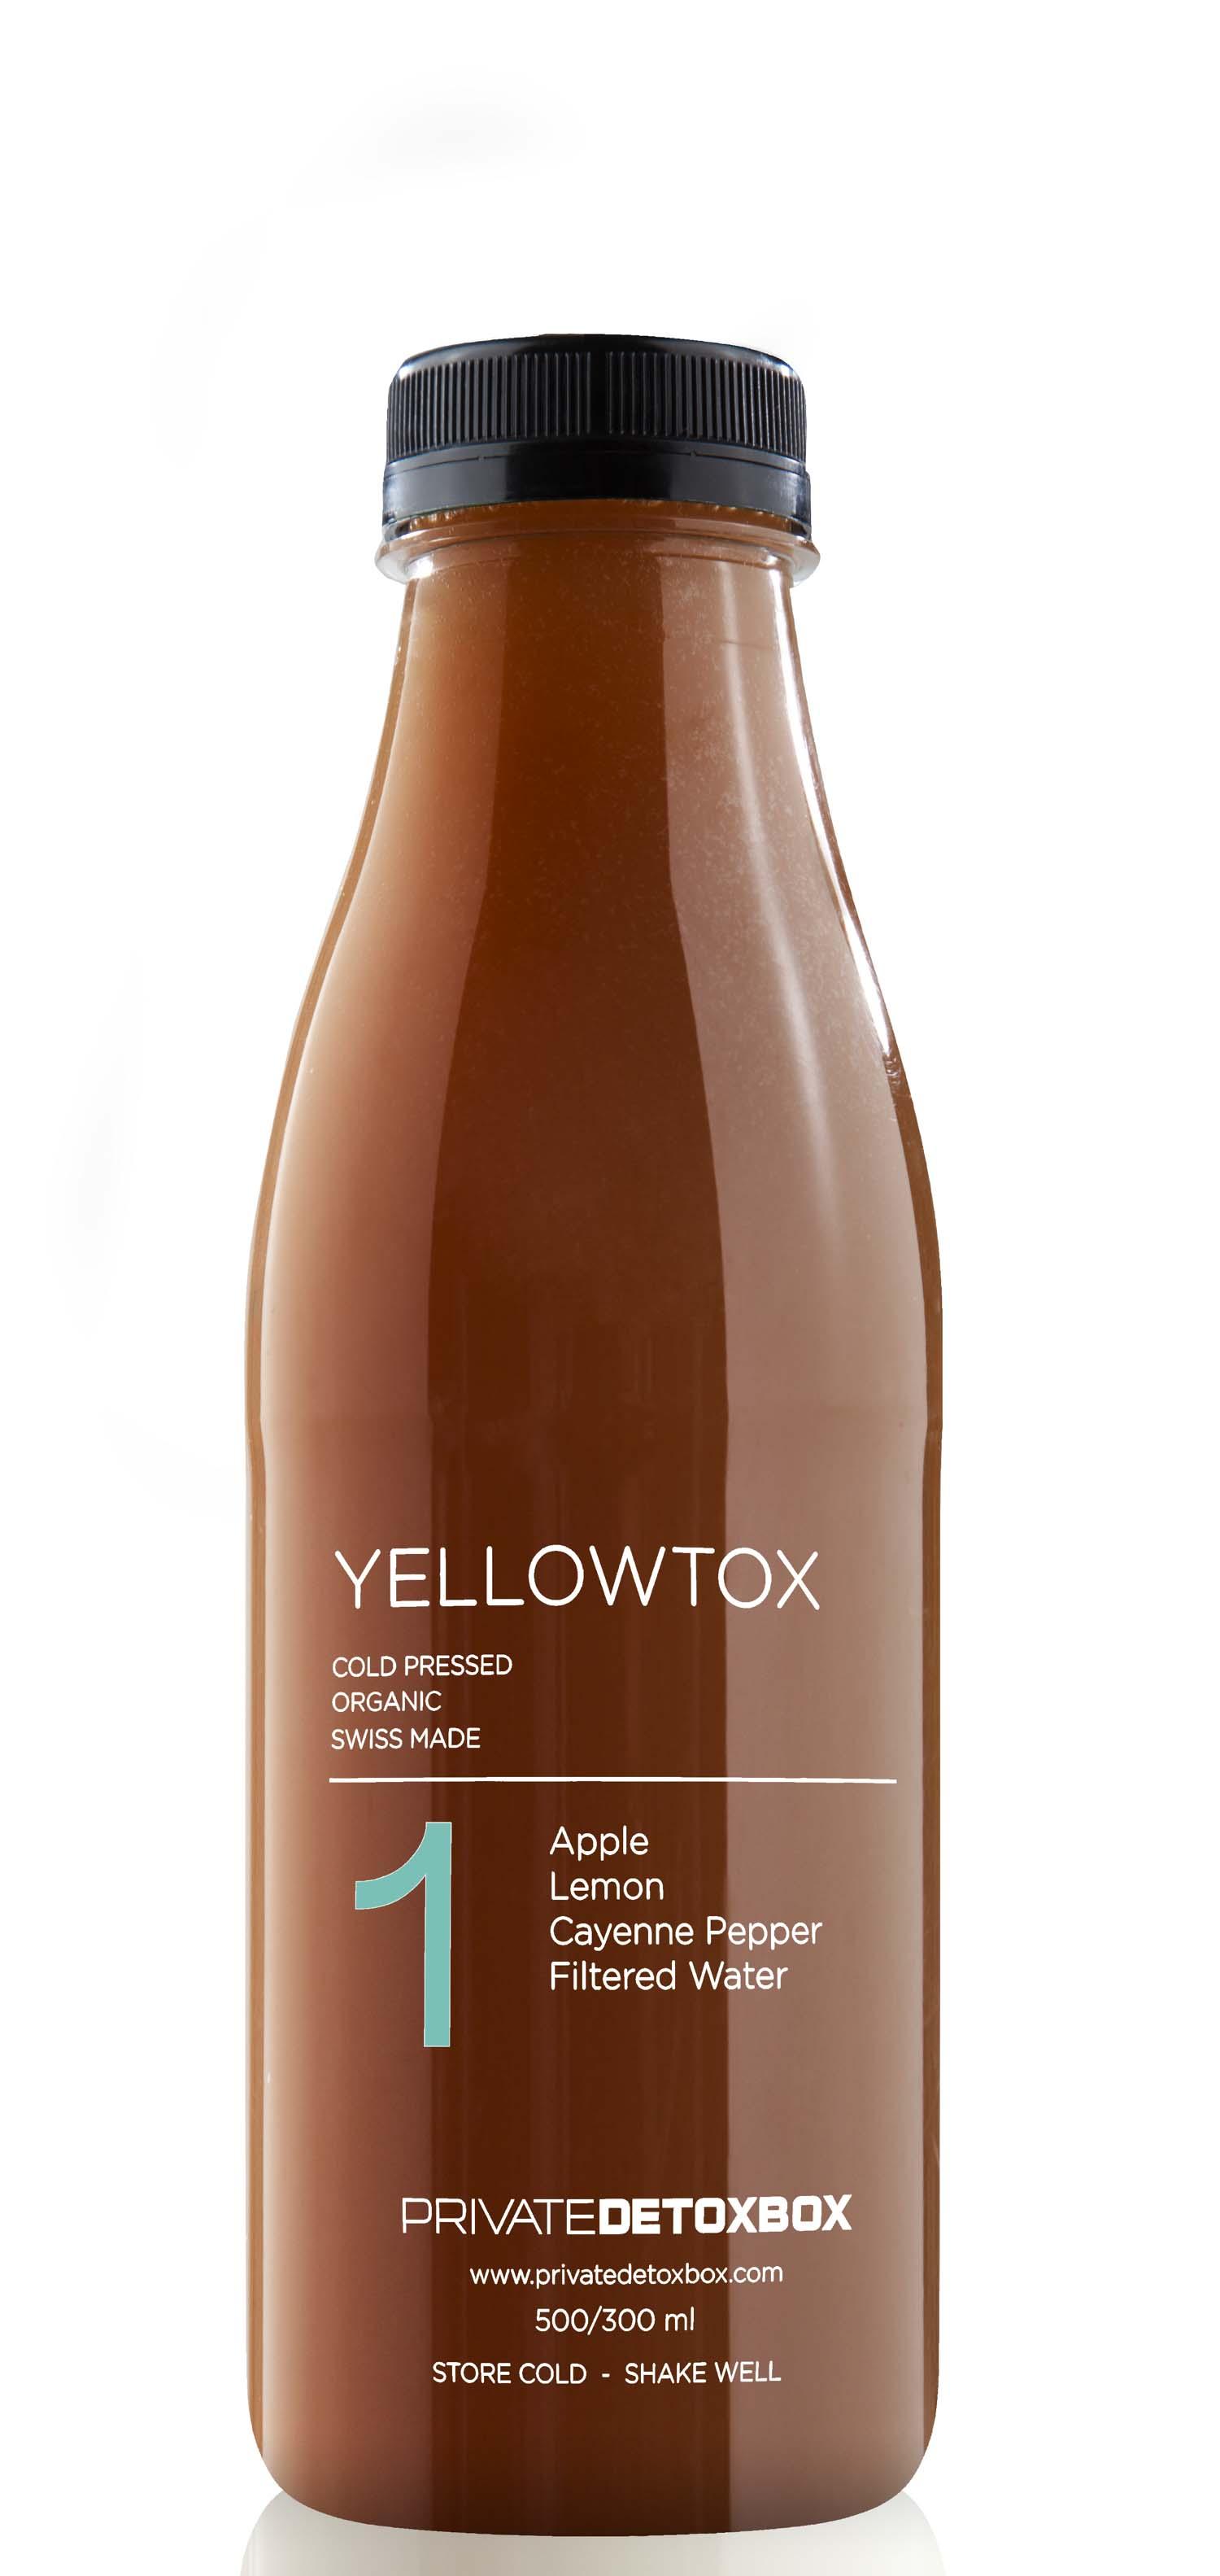 yellowtox.jpg